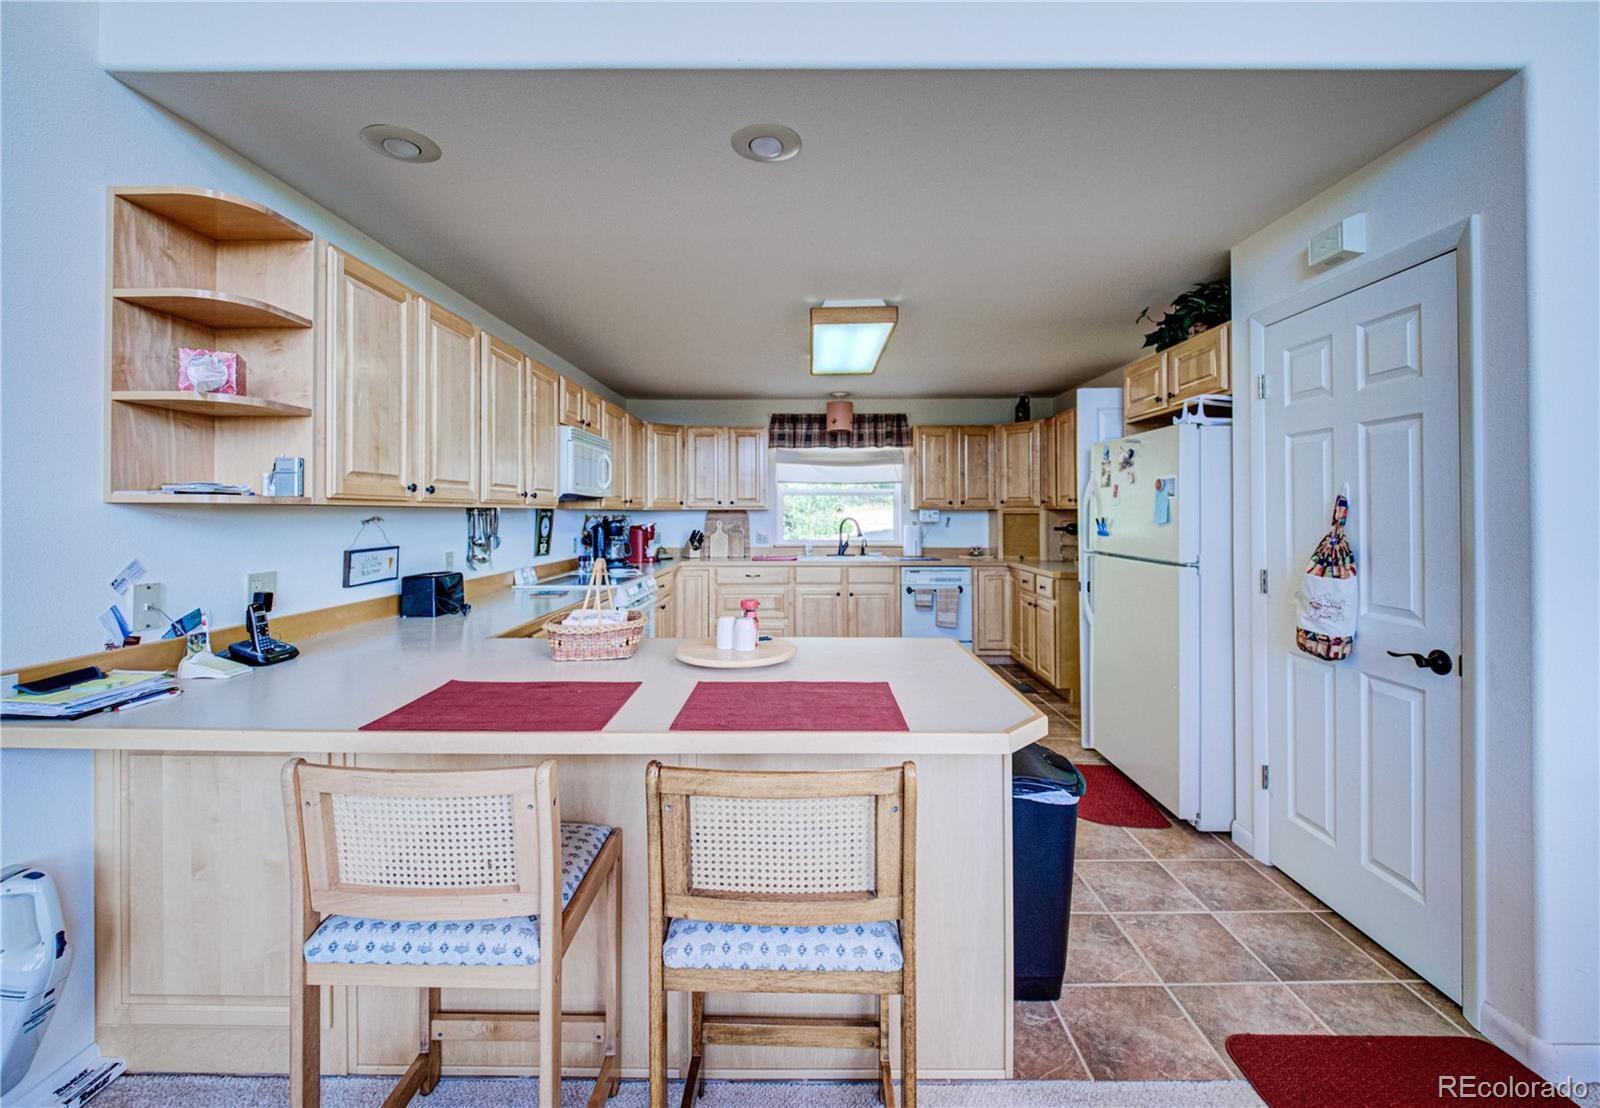 MLS# 3332968 - 12 - 296 Cedar Bluff Drive, Cotopaxi, CO 81223